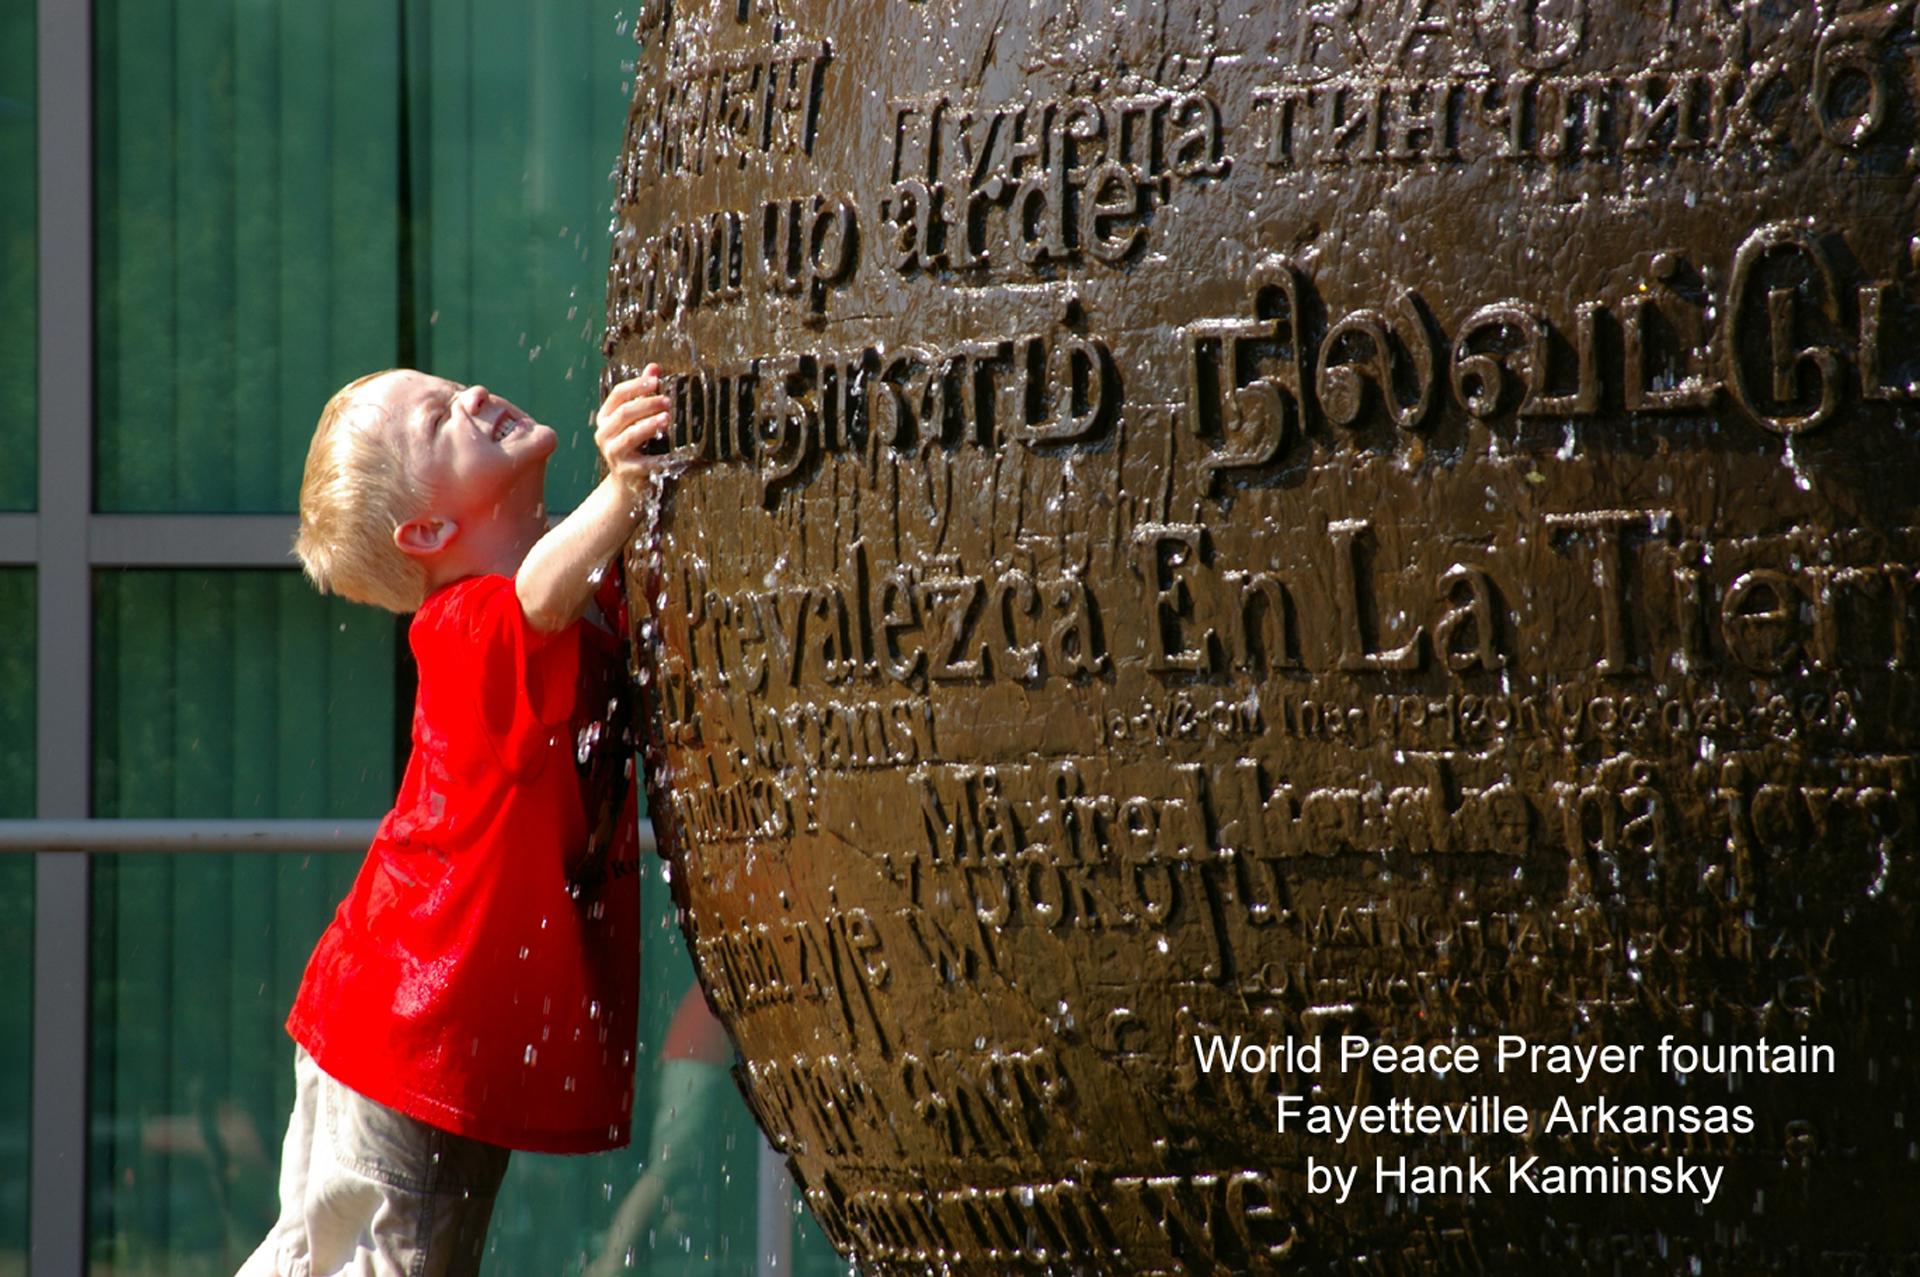 The World Peace Prayer Fountain Sculpture